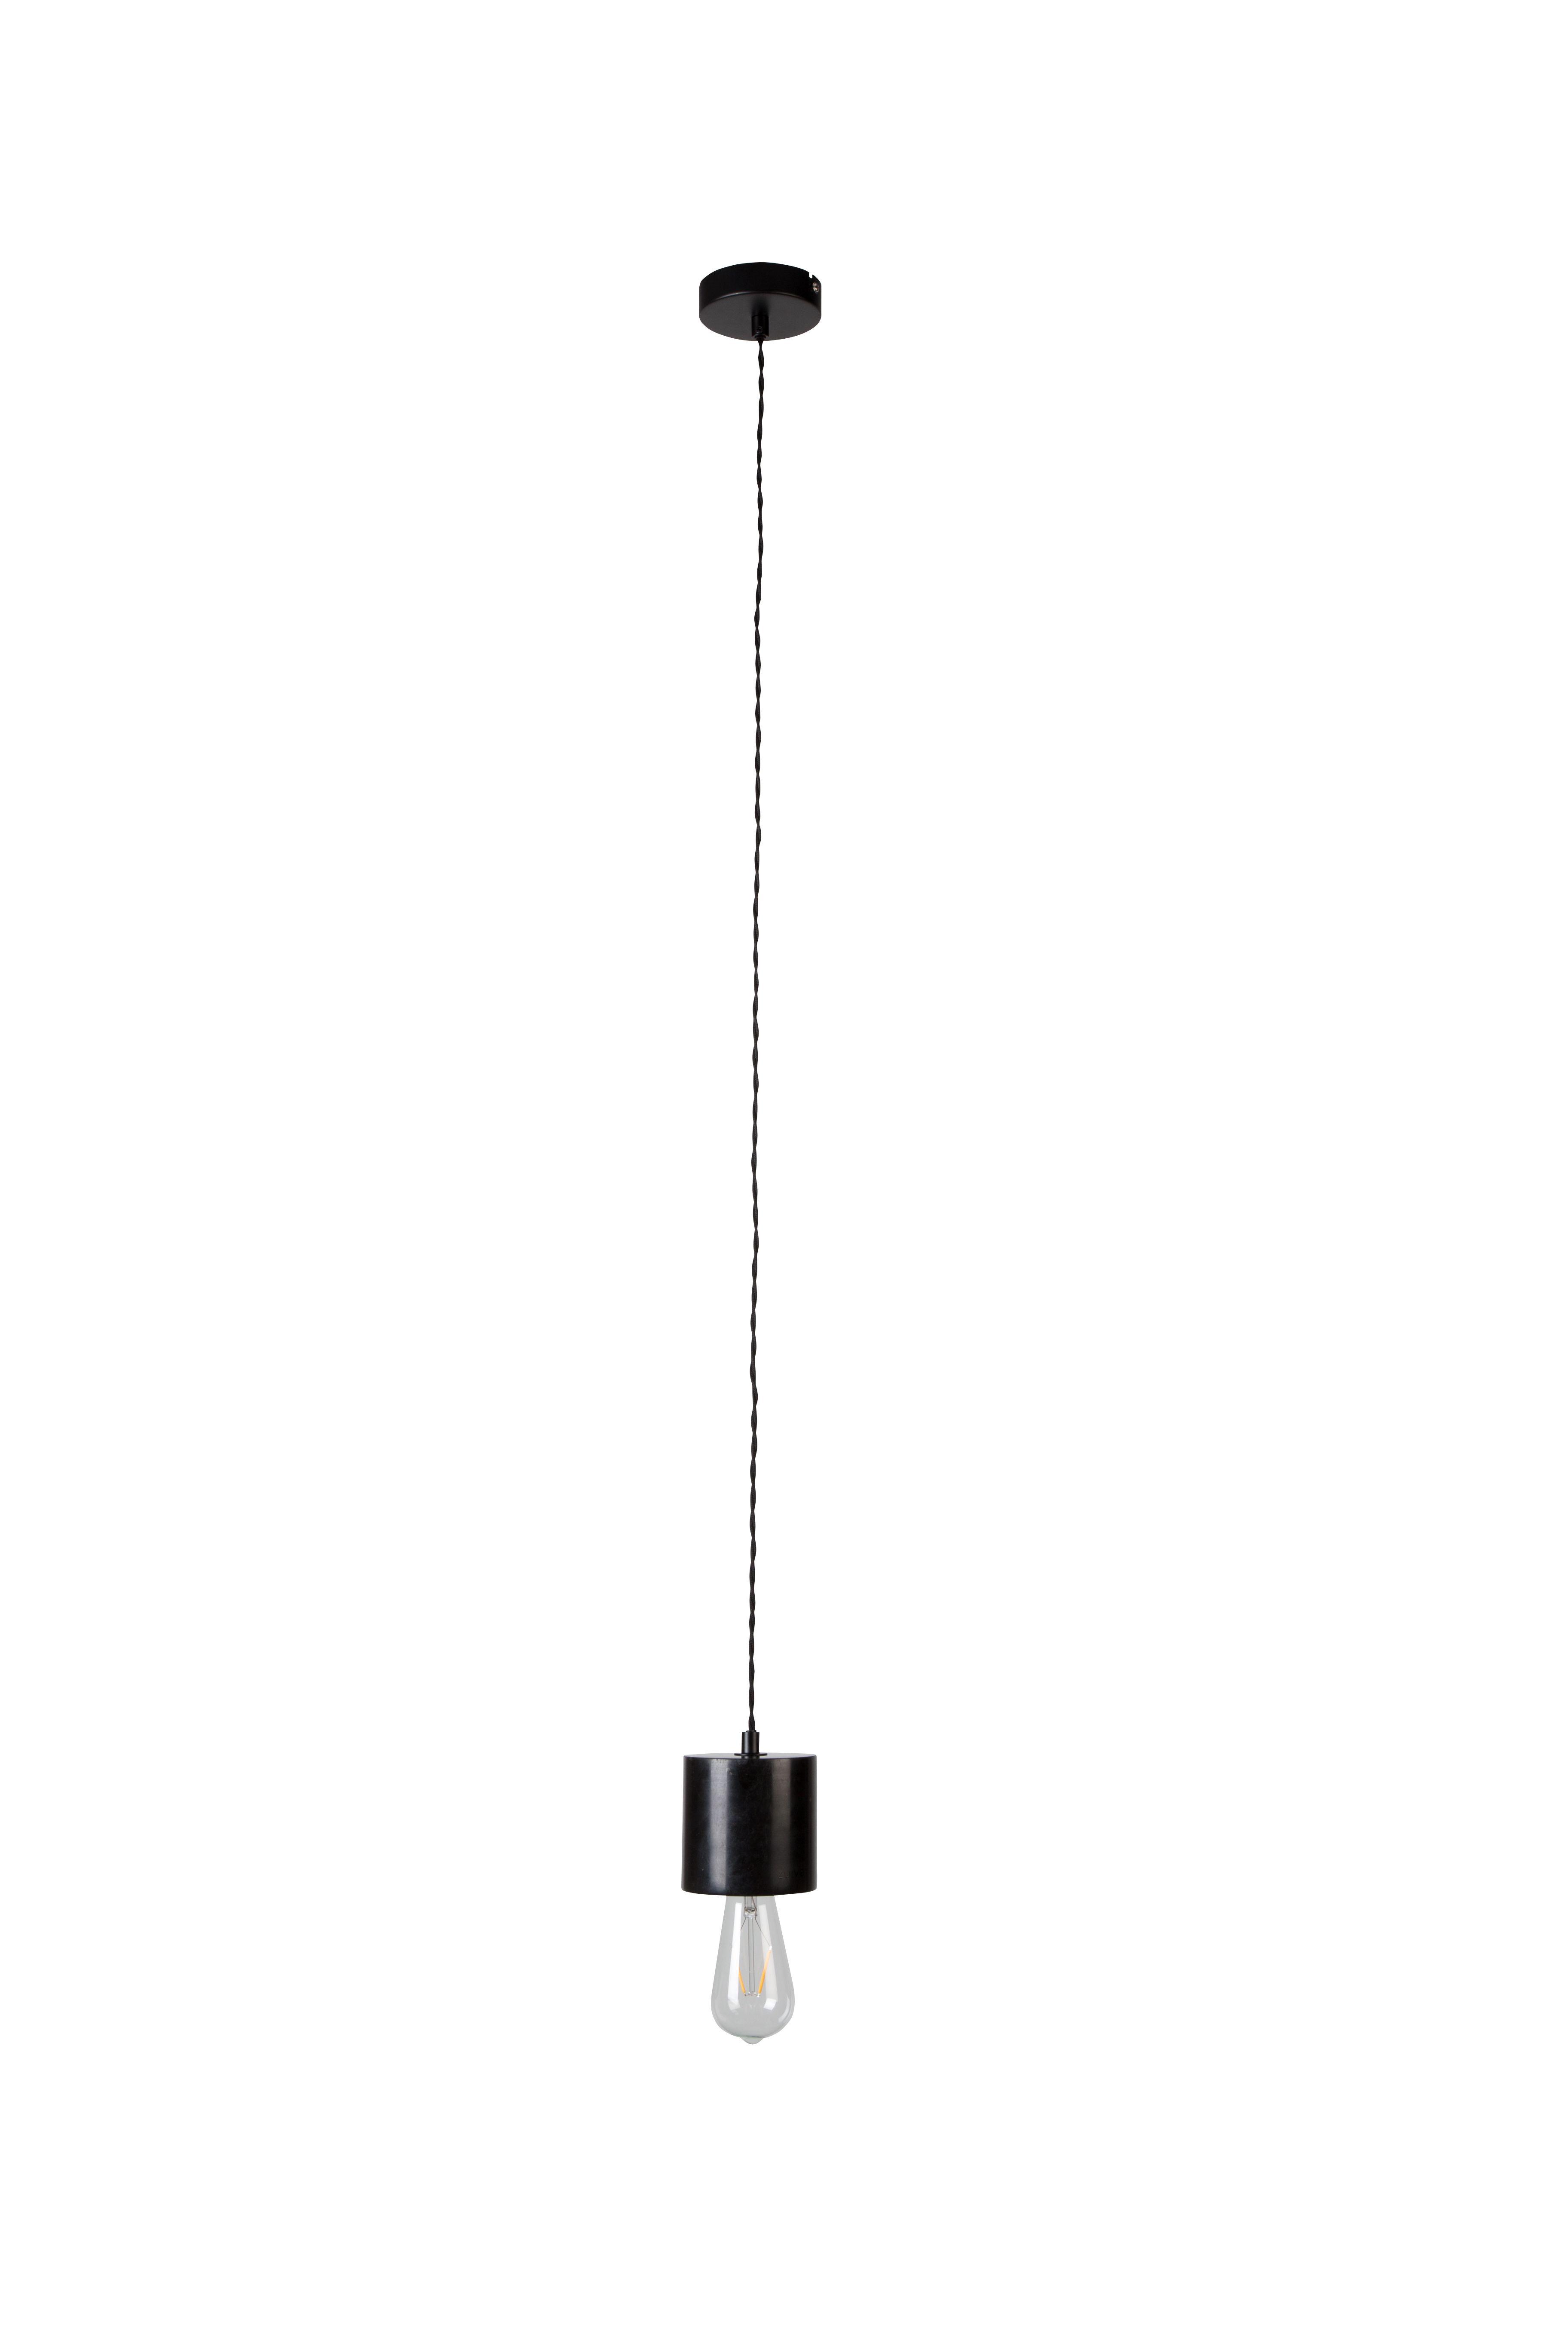 Trust Pendant Lamp Zuiver Black Pendant Lamp Pendant Light Pendant Lamp